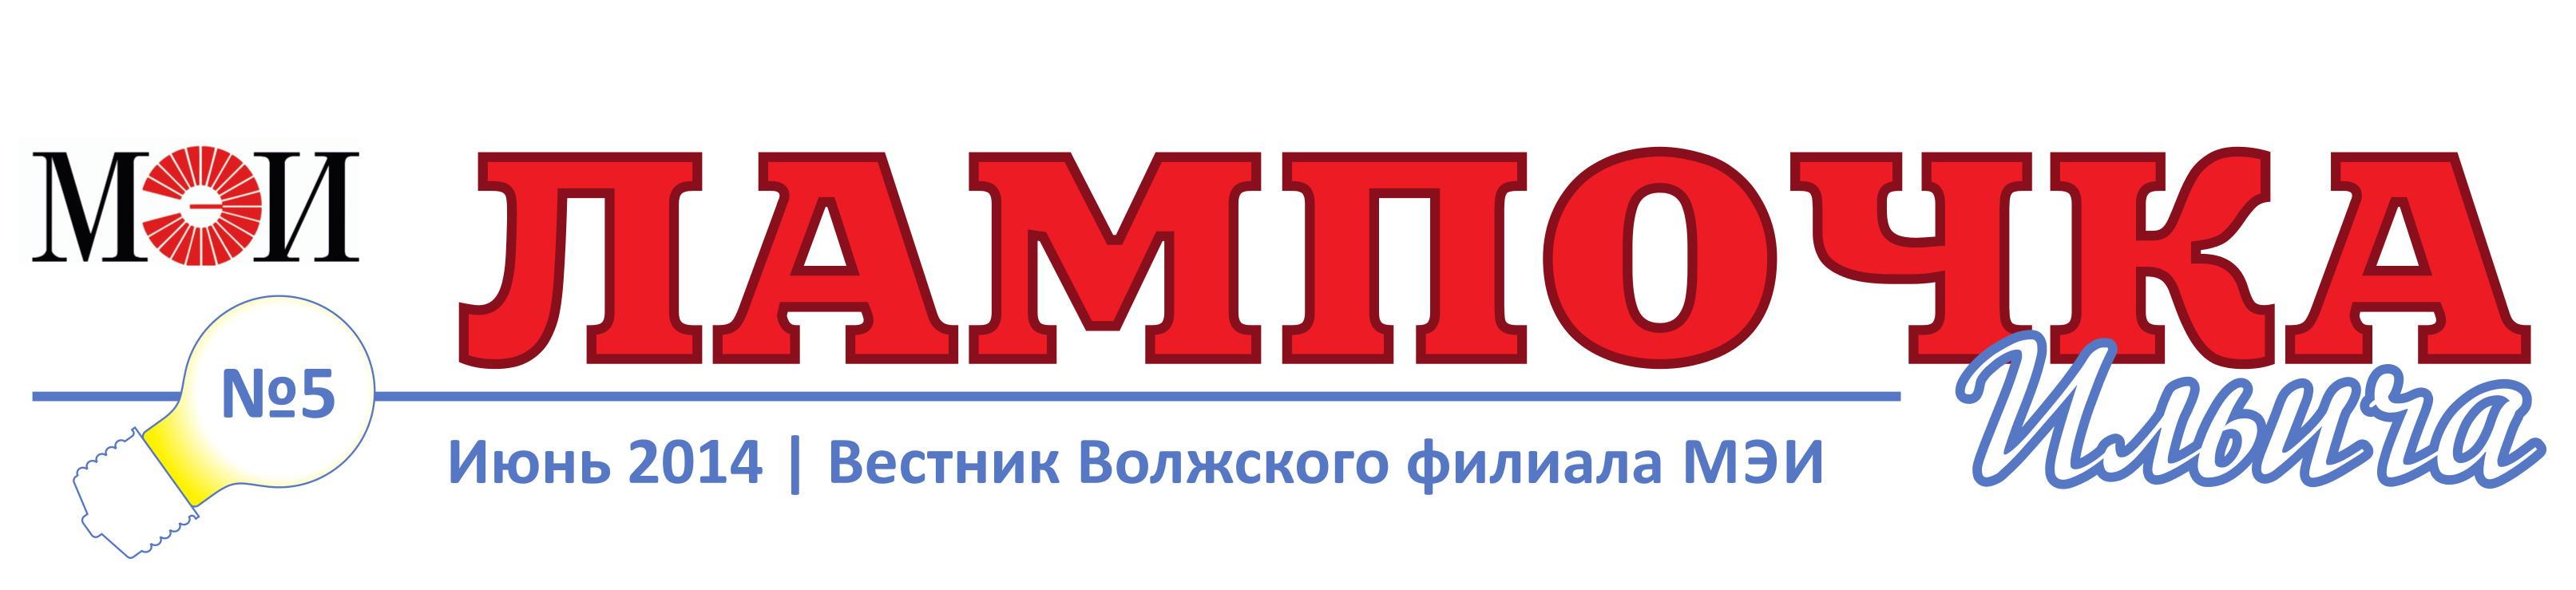 газета-05 (2014 март)